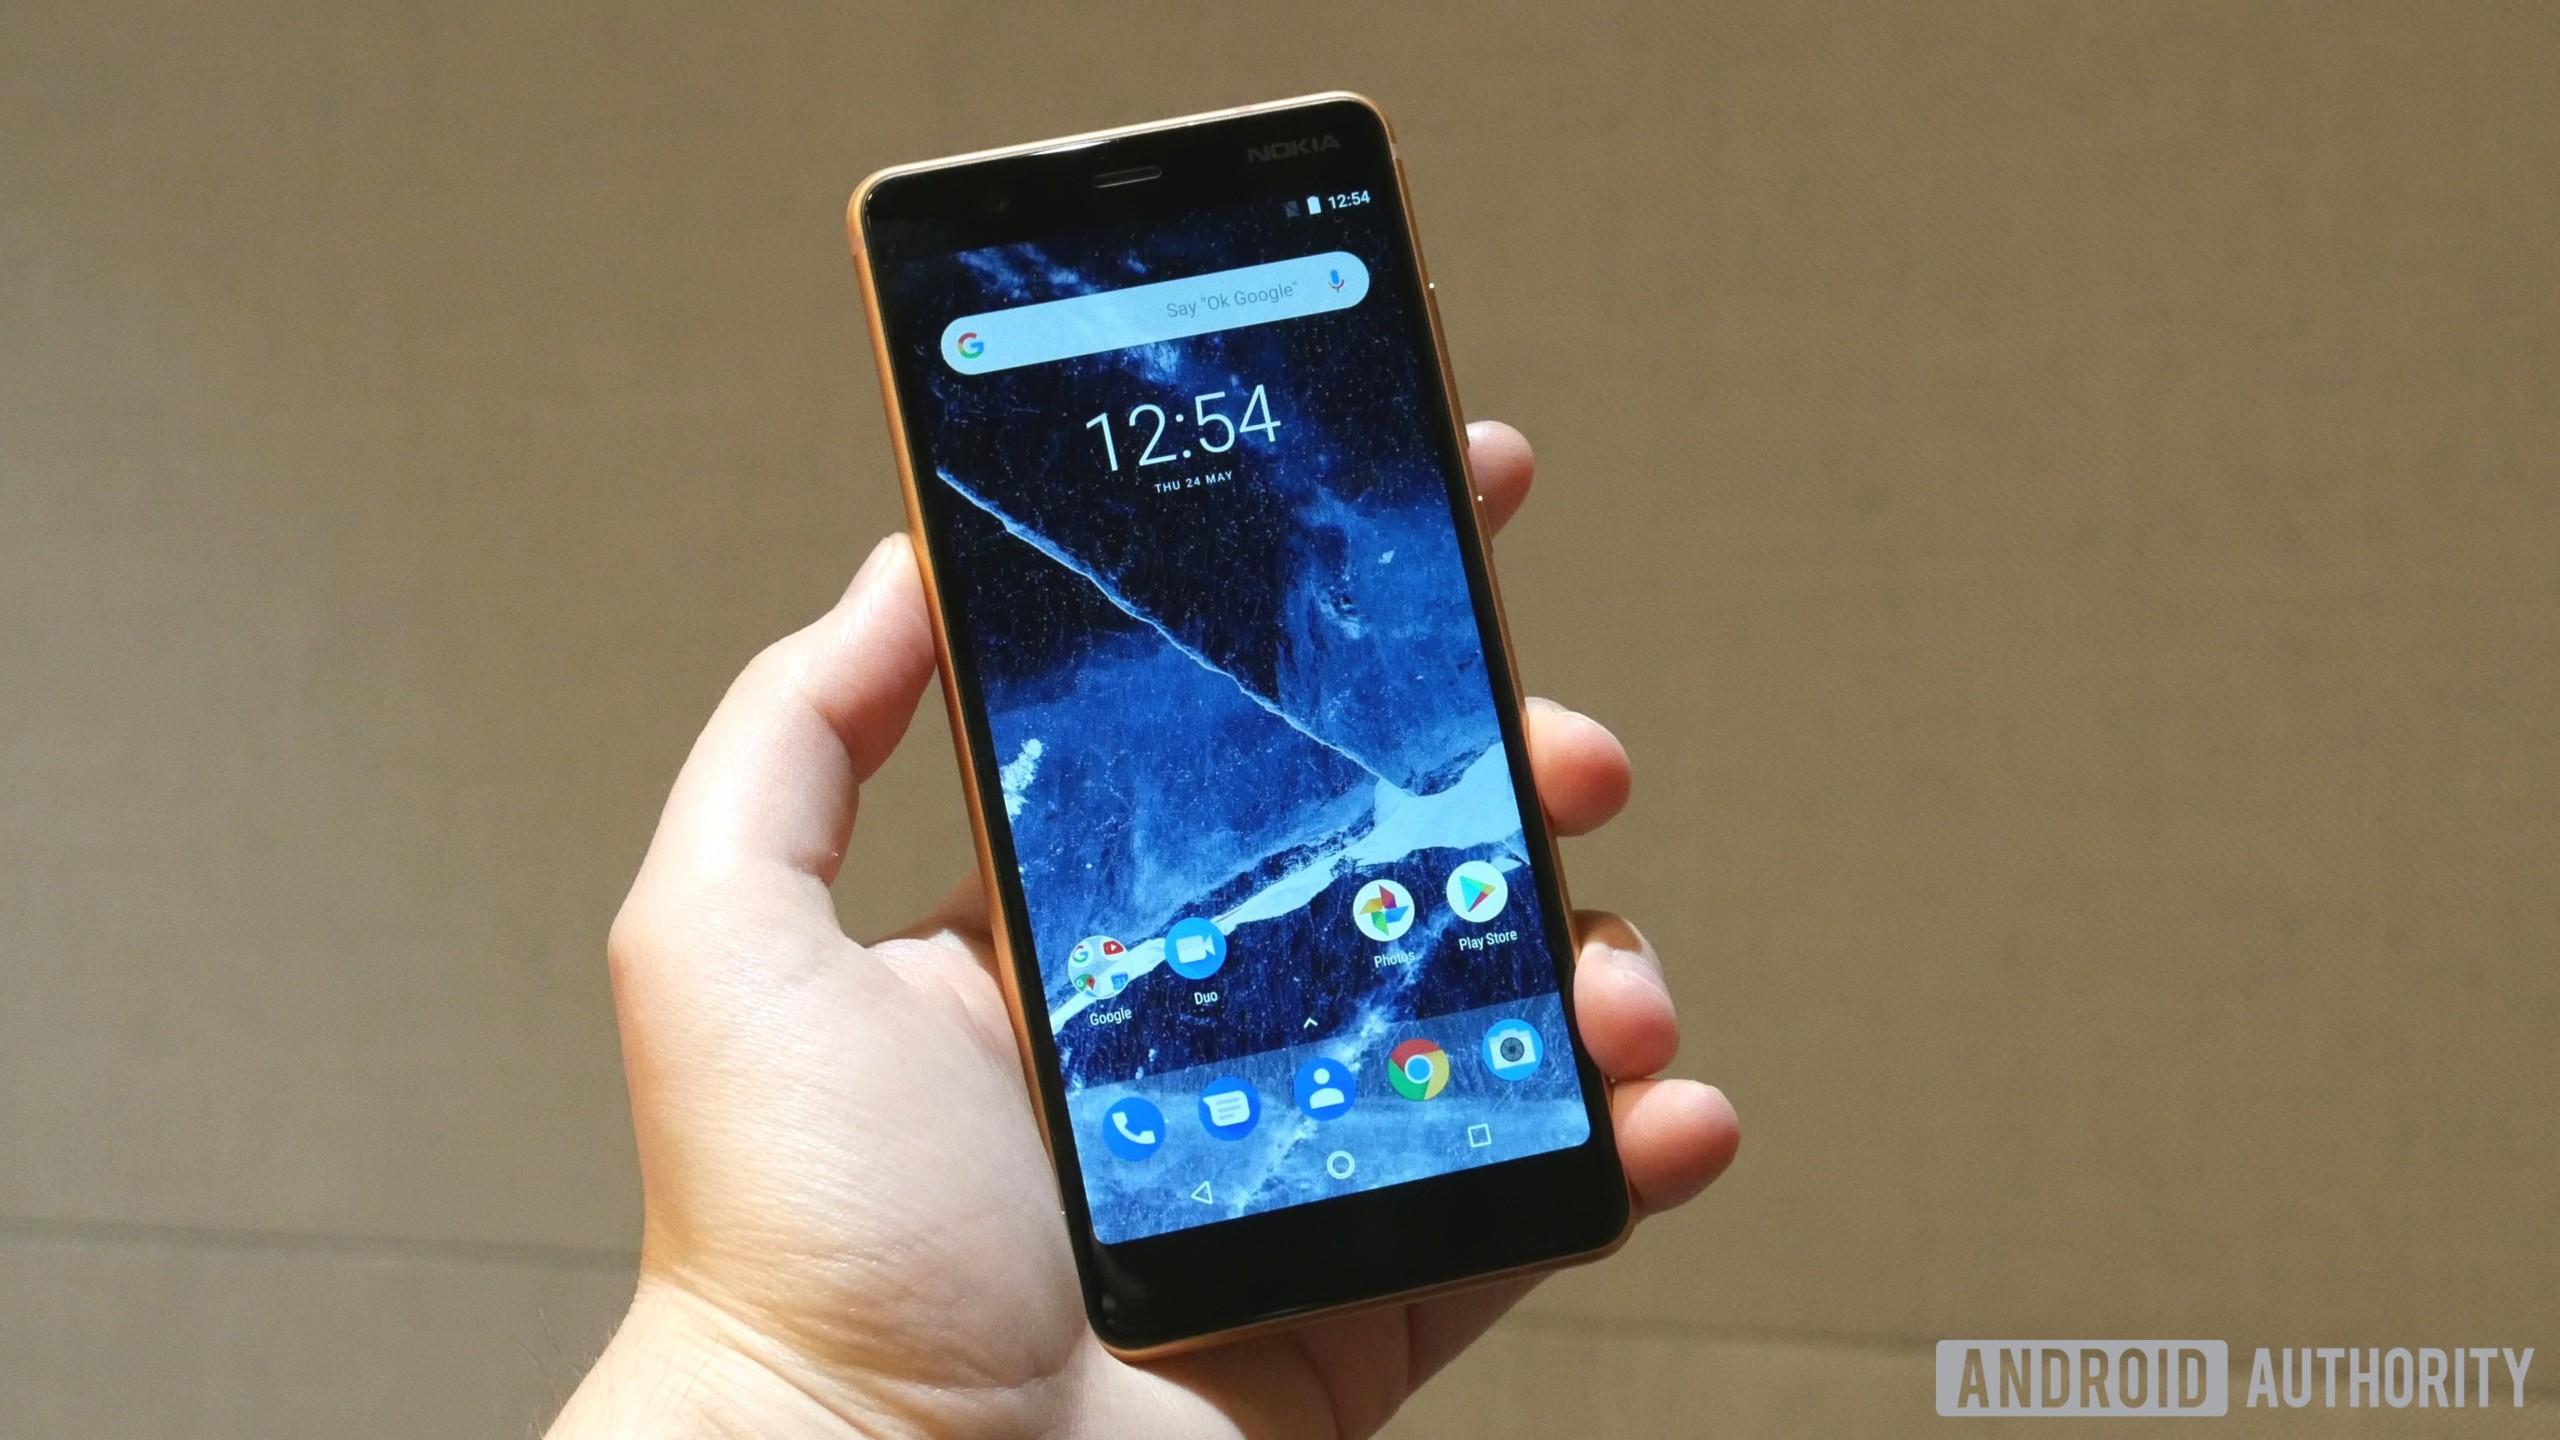 Nokia 5.1 smartphone